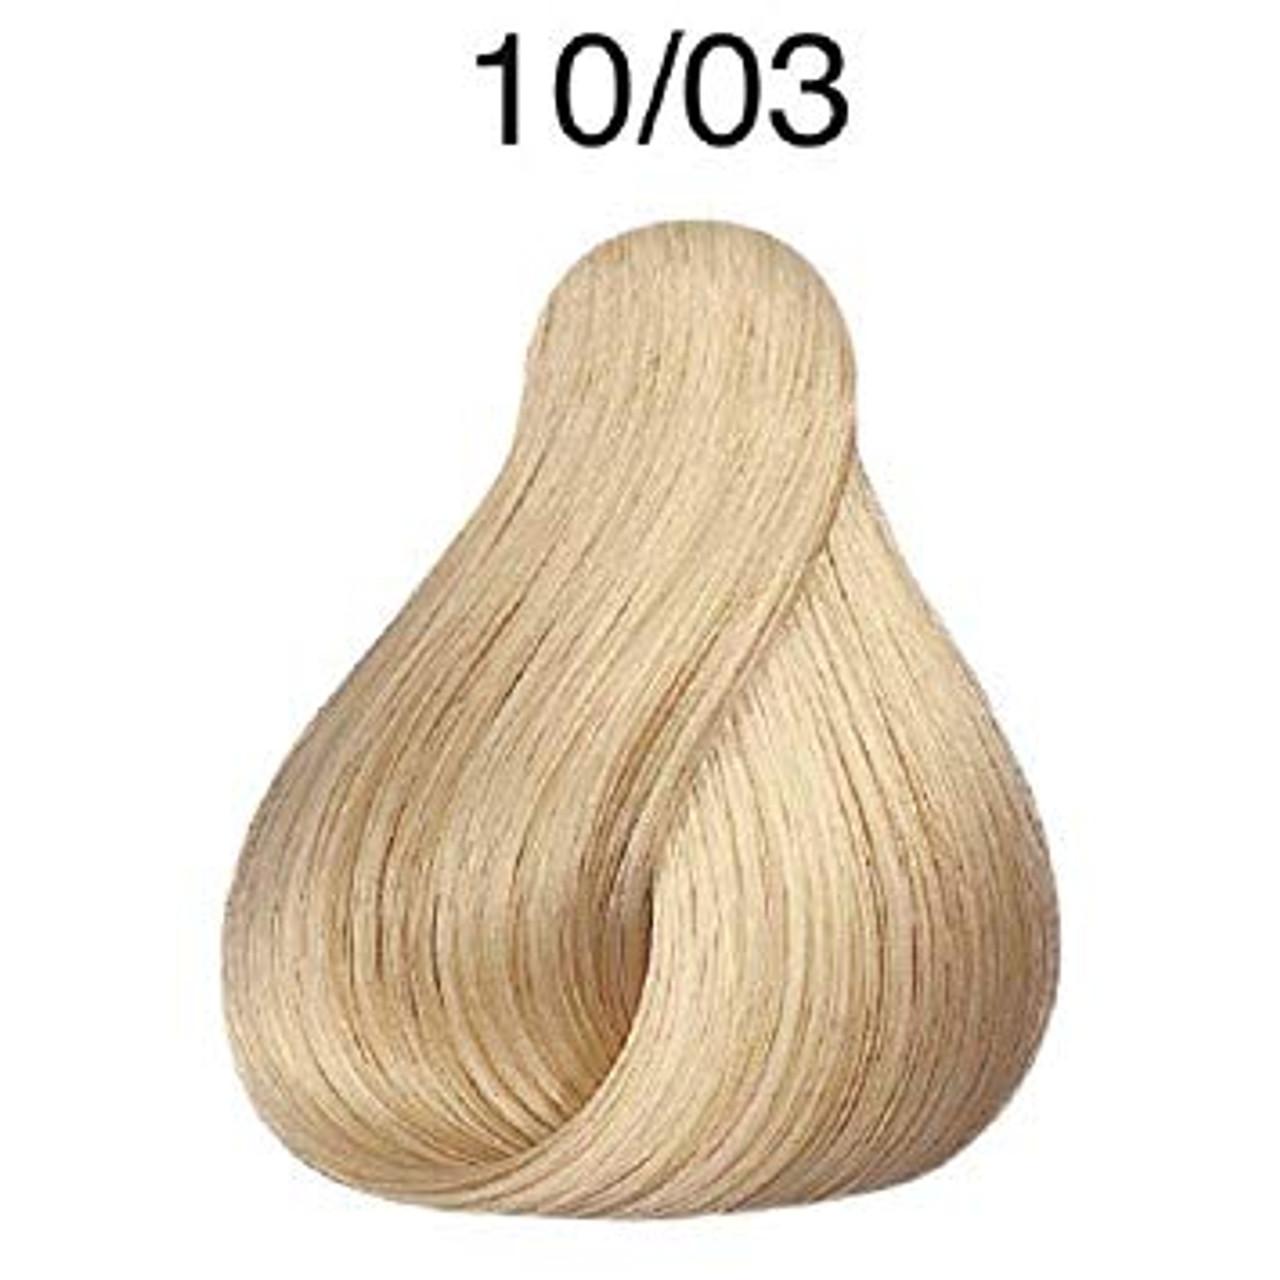 Wella 10/03 Semi-Permanent Hair Color